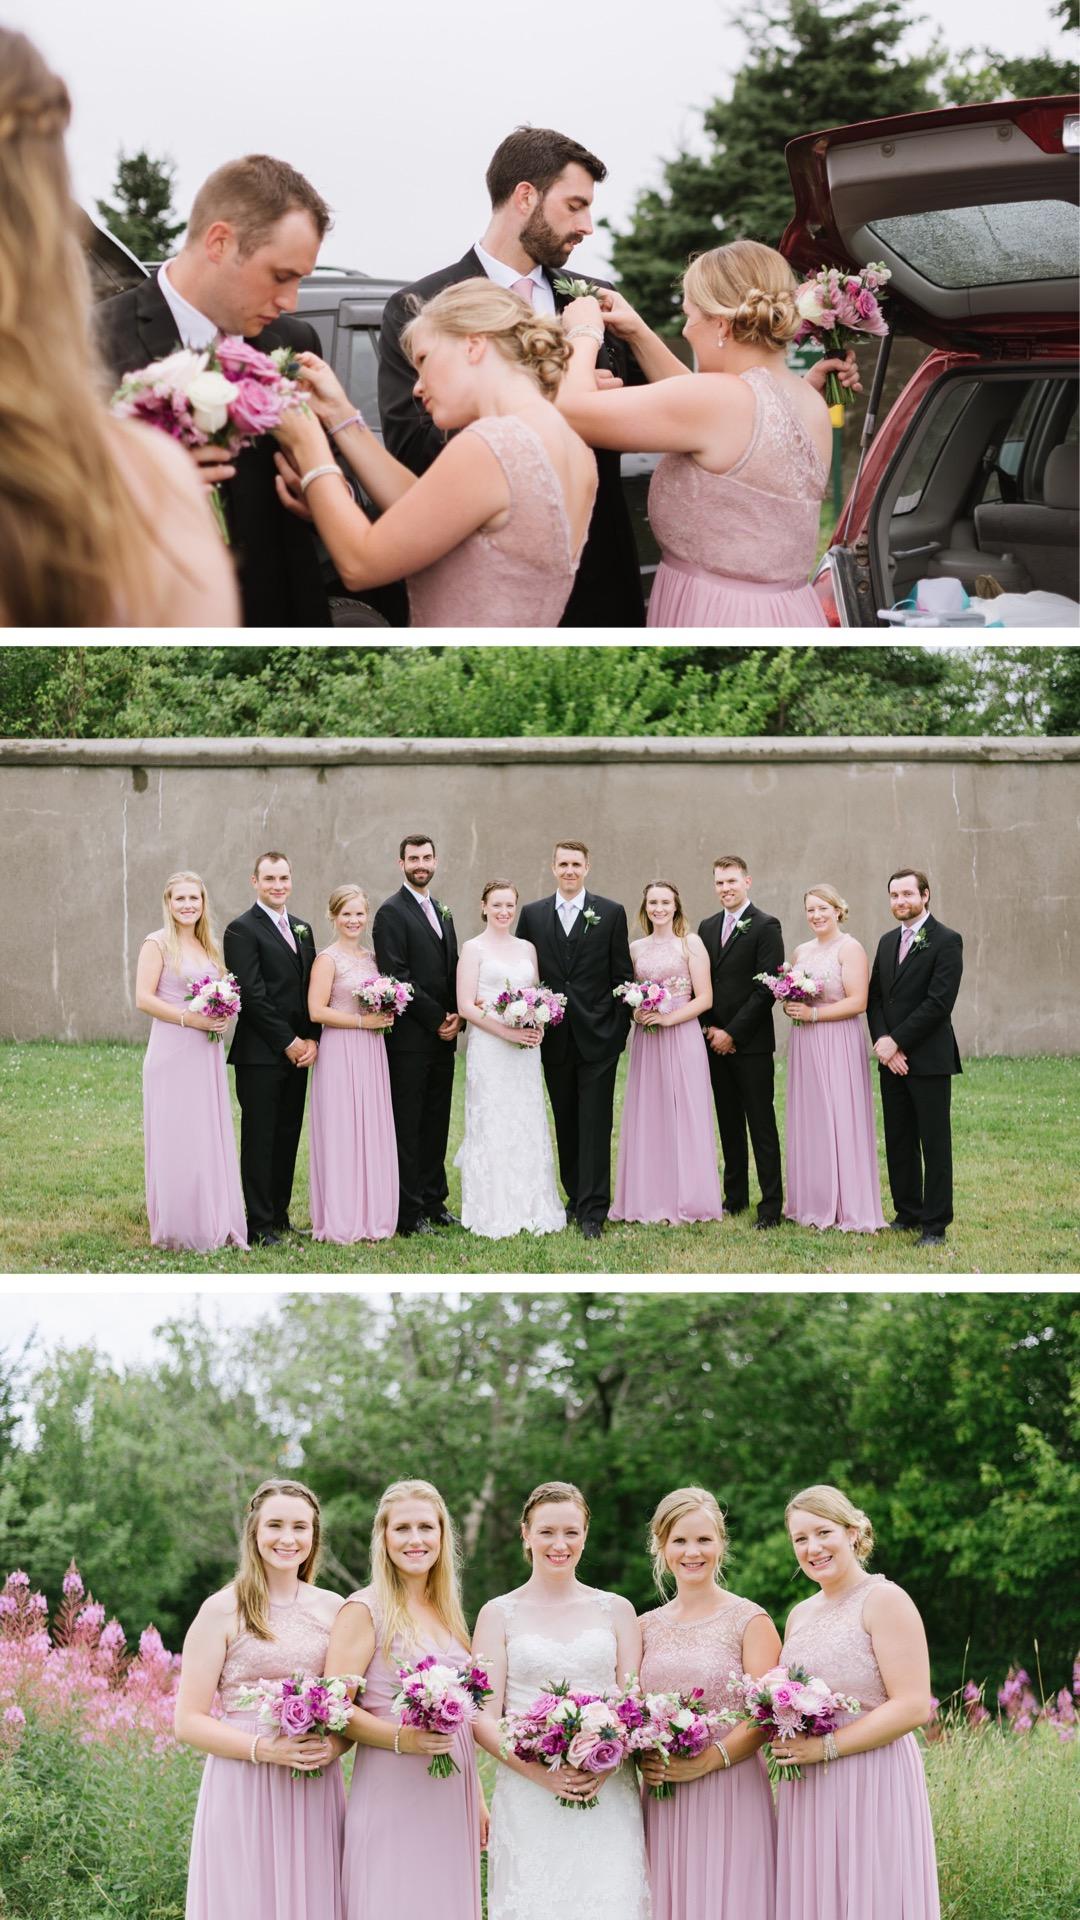 Martina & Scott Halifax Wedding Photographer - Sinead Dubeau Photography 04